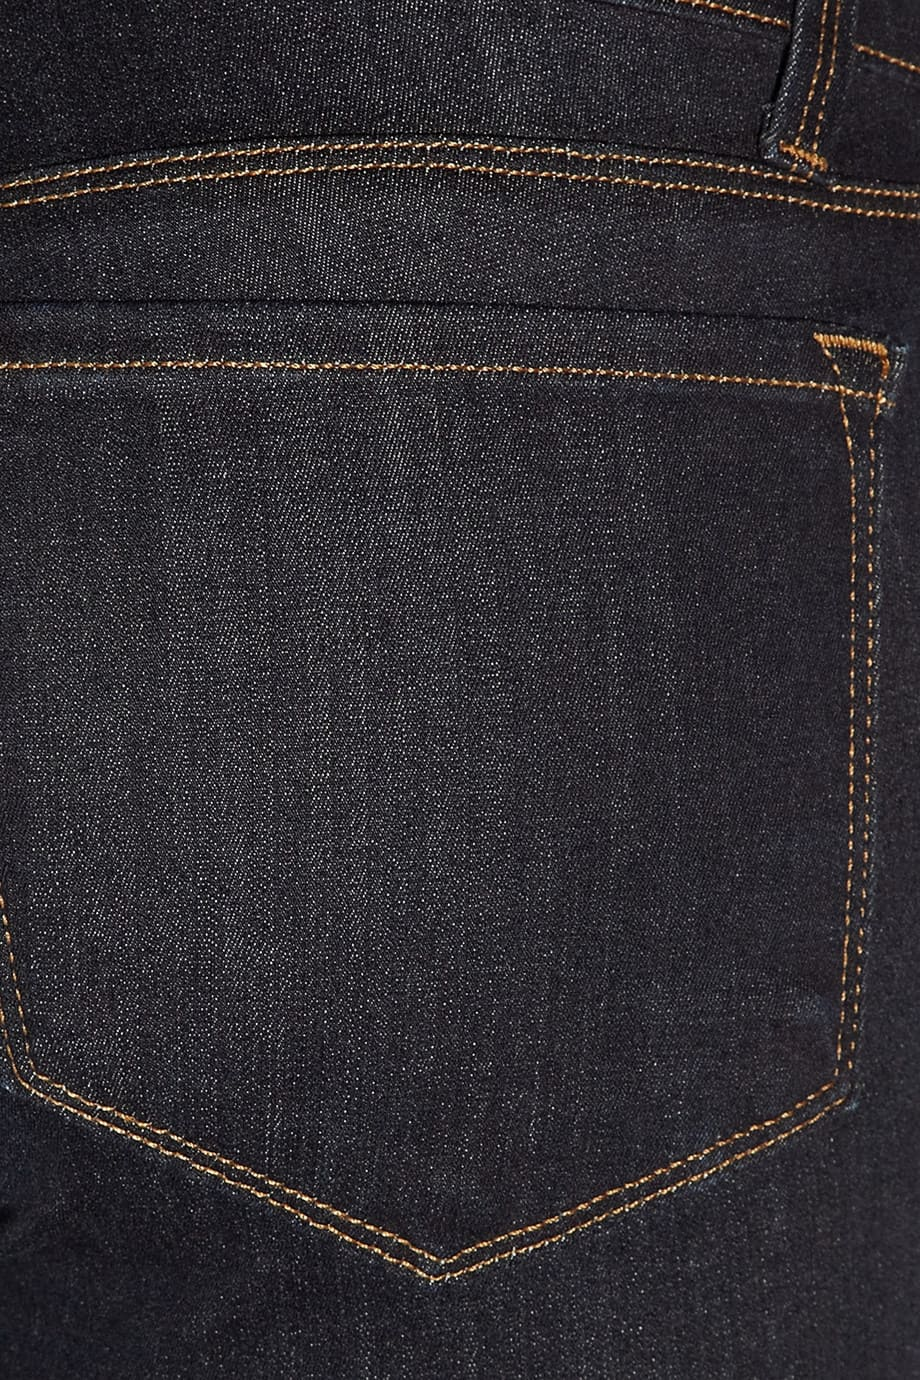 image Arborer le look de (Black Widow) Natasha Romanoff en jeans J Brand 23